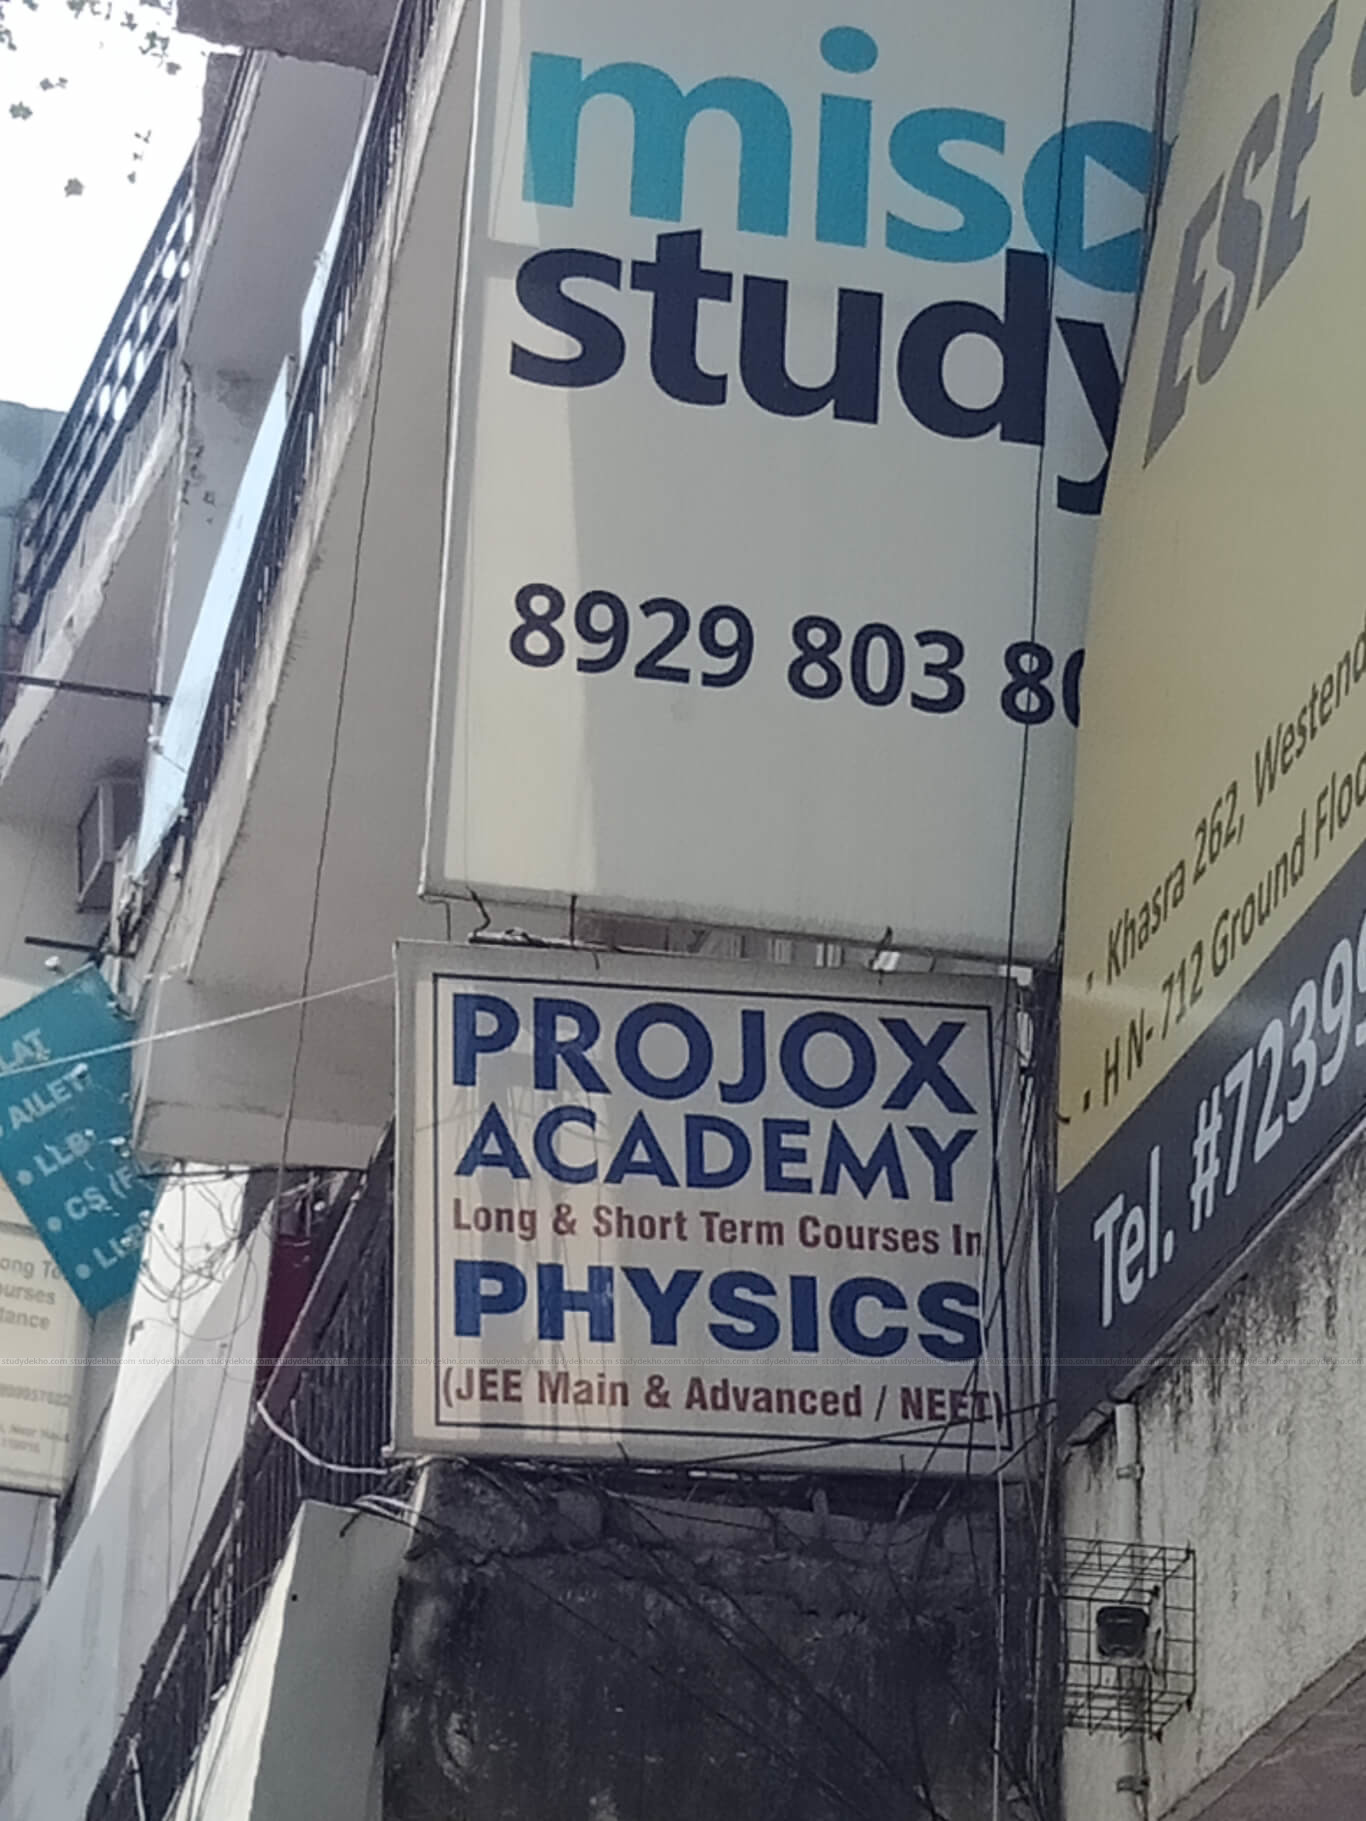 PROJOX ACADEMY Gallery